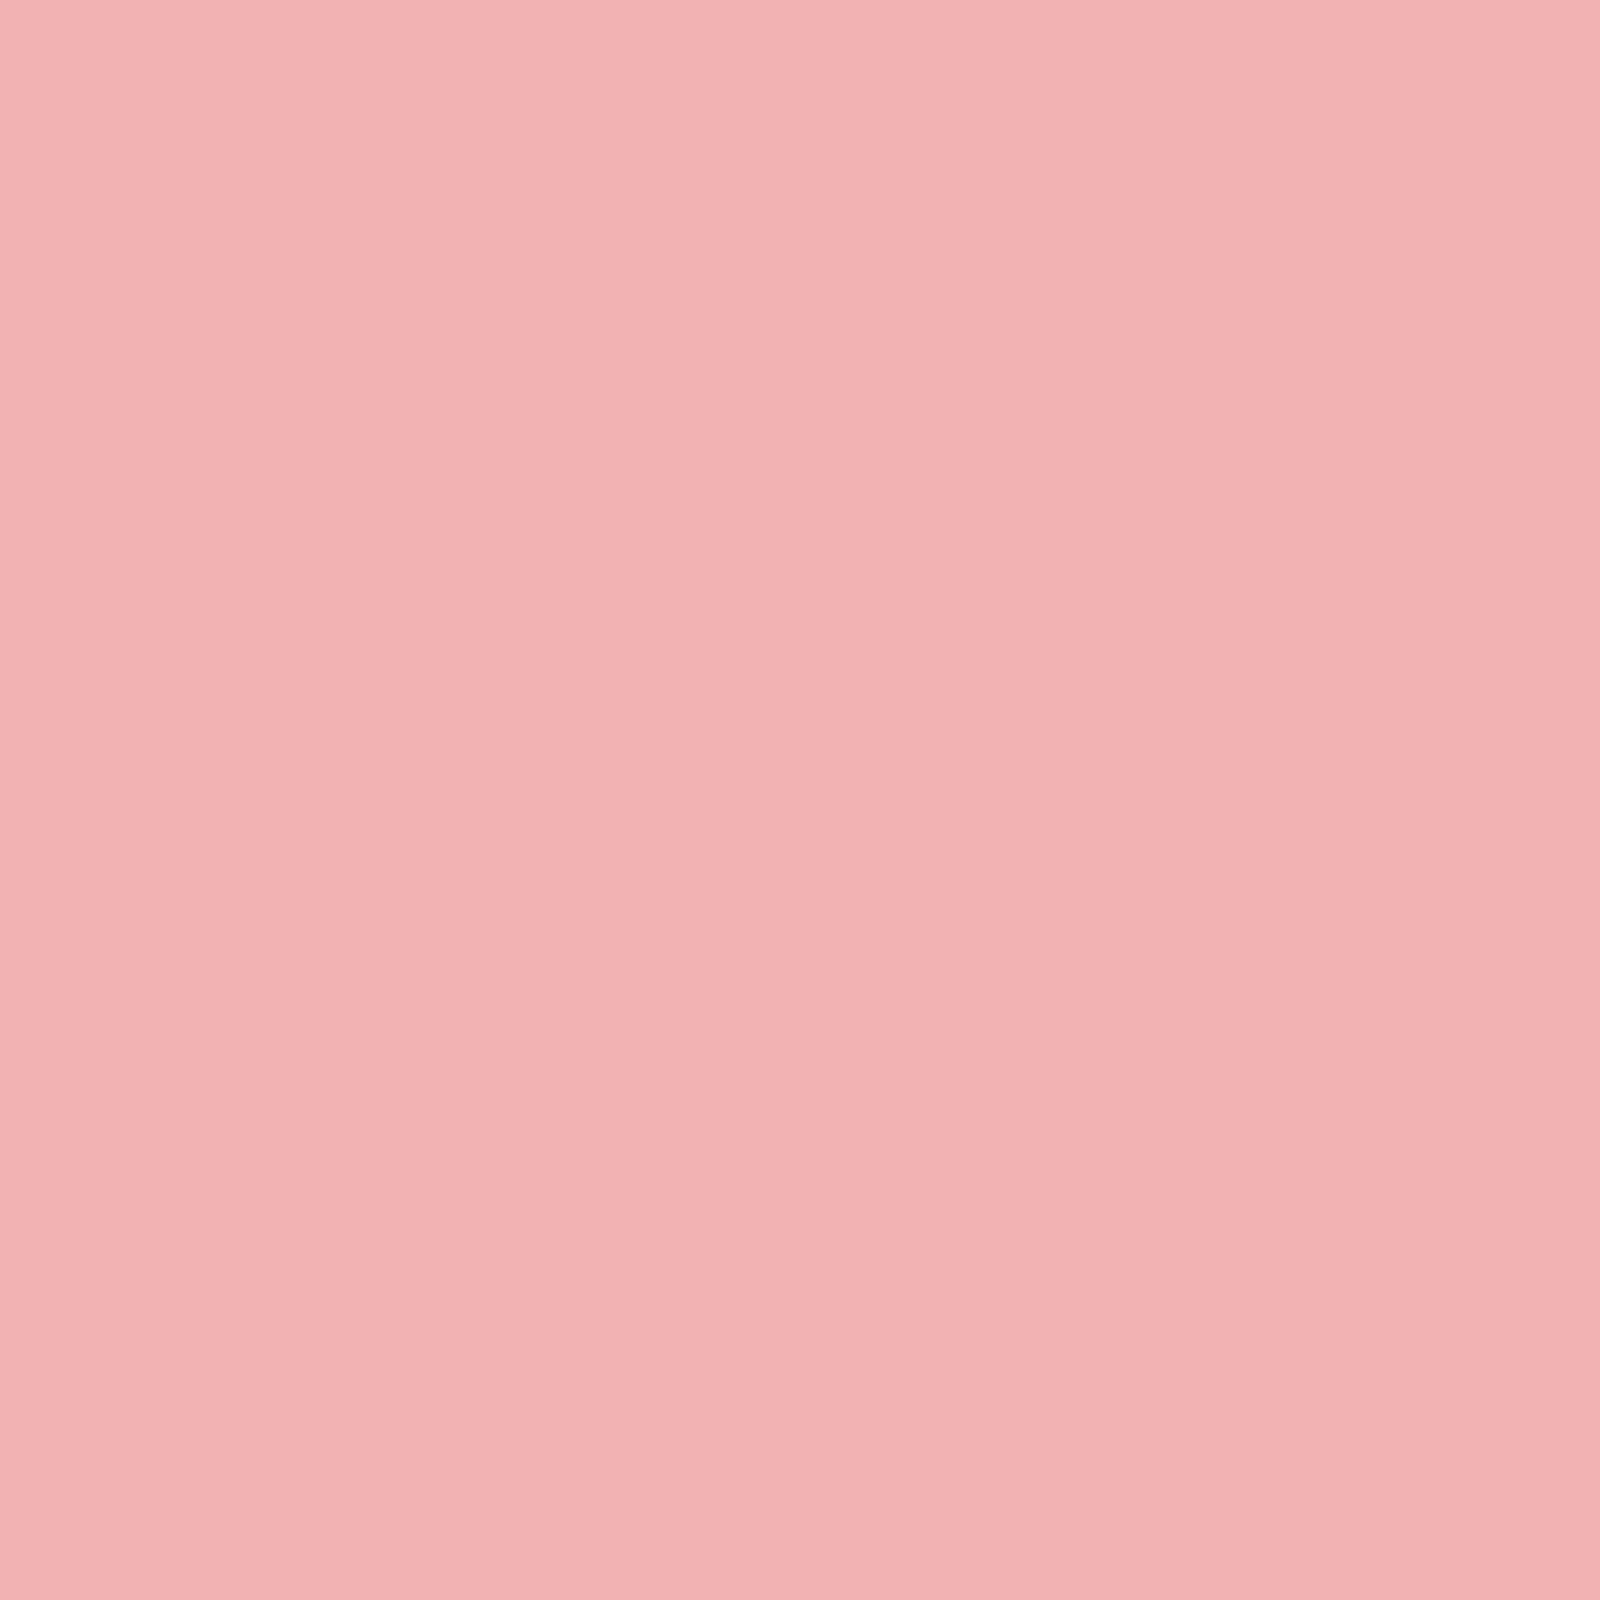 Cosmo Floss - 104 Impatiens Pink